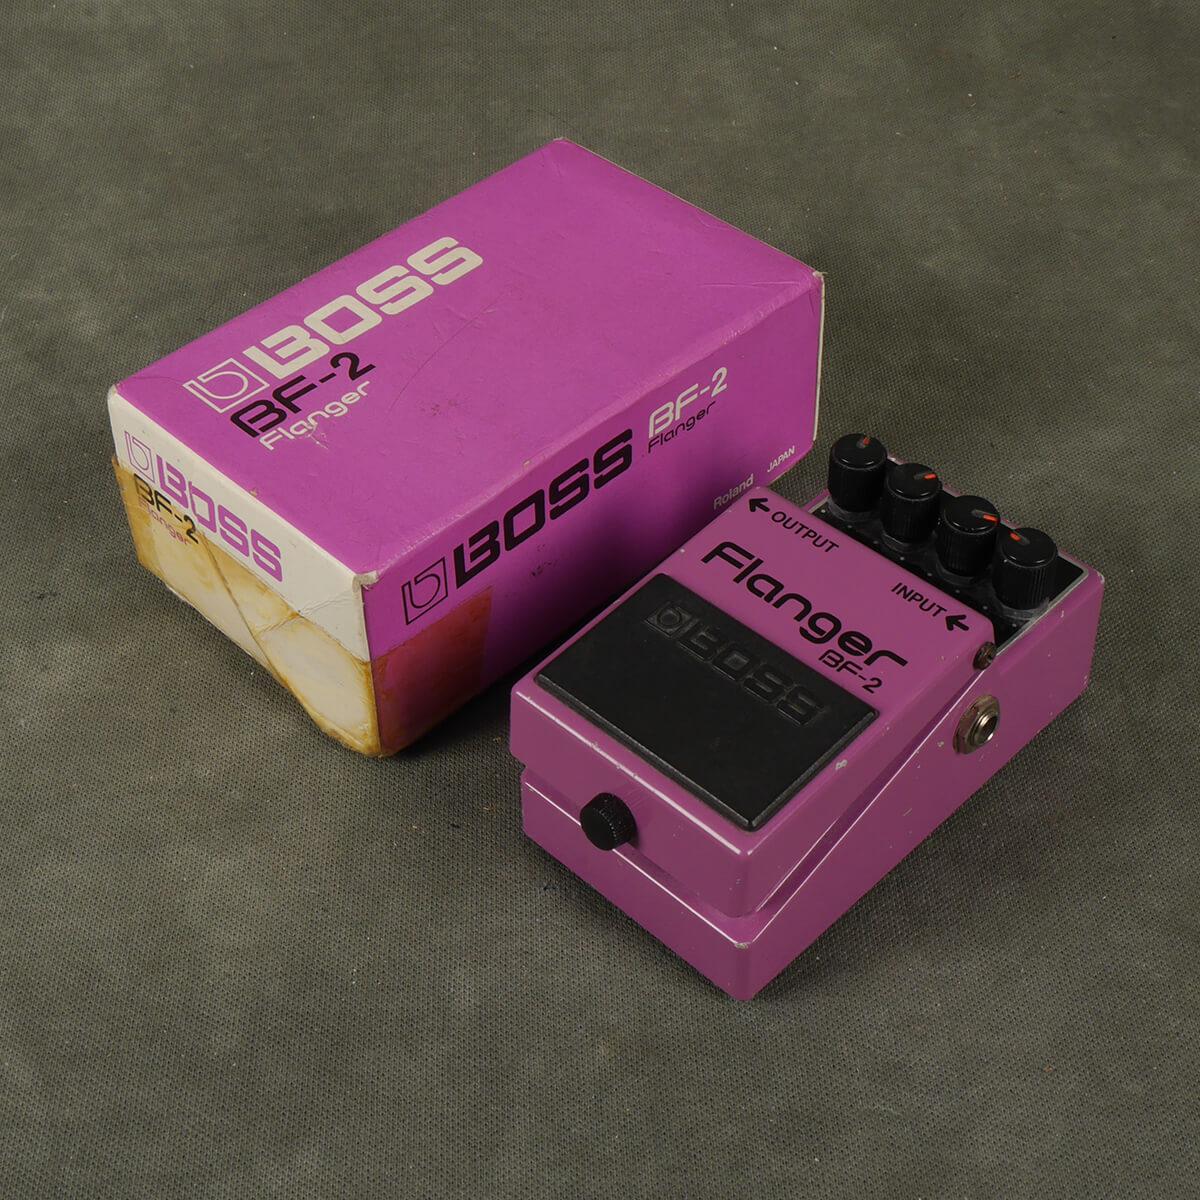 Boss BF-2 Flanger FX Pedal w/Box - 2nd Hand